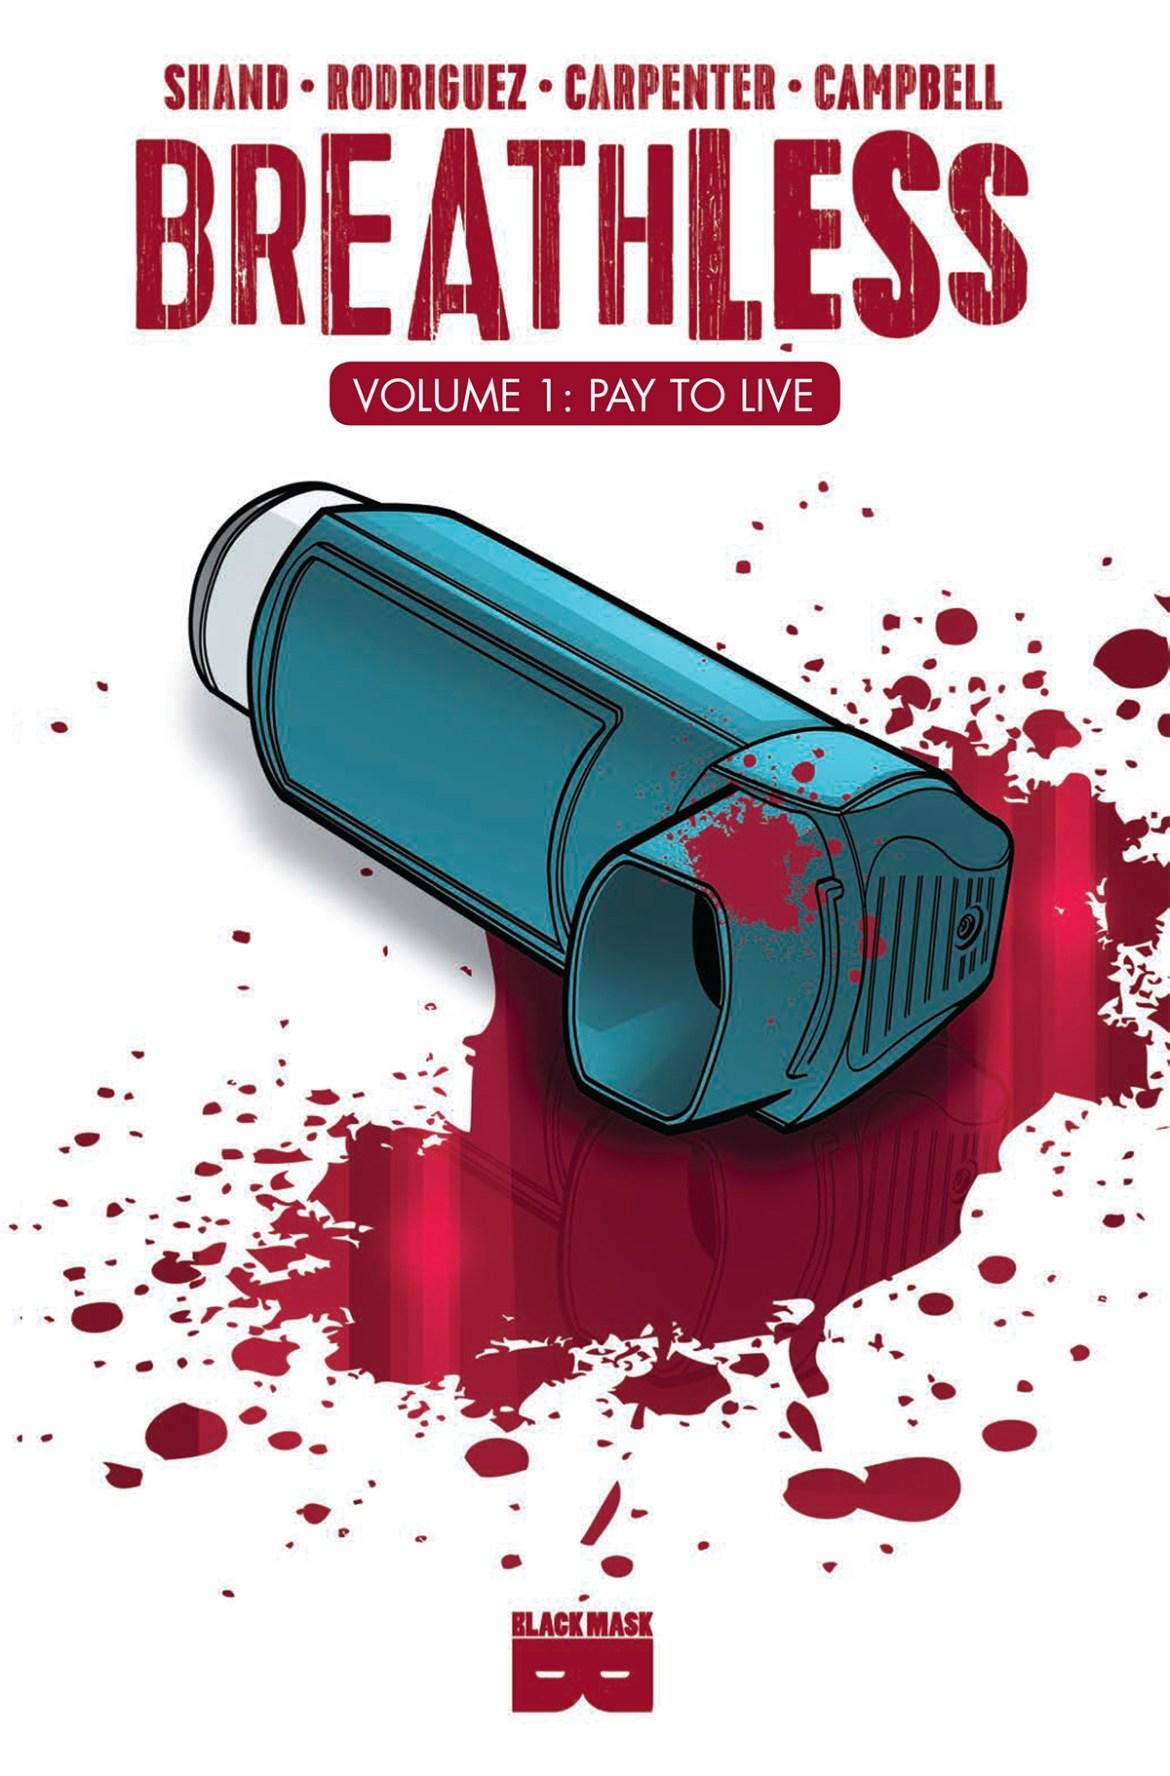 9881958e-146d-420b-a52f-5d698b6d4d09 ComicList Previews: BREATHLESS TP